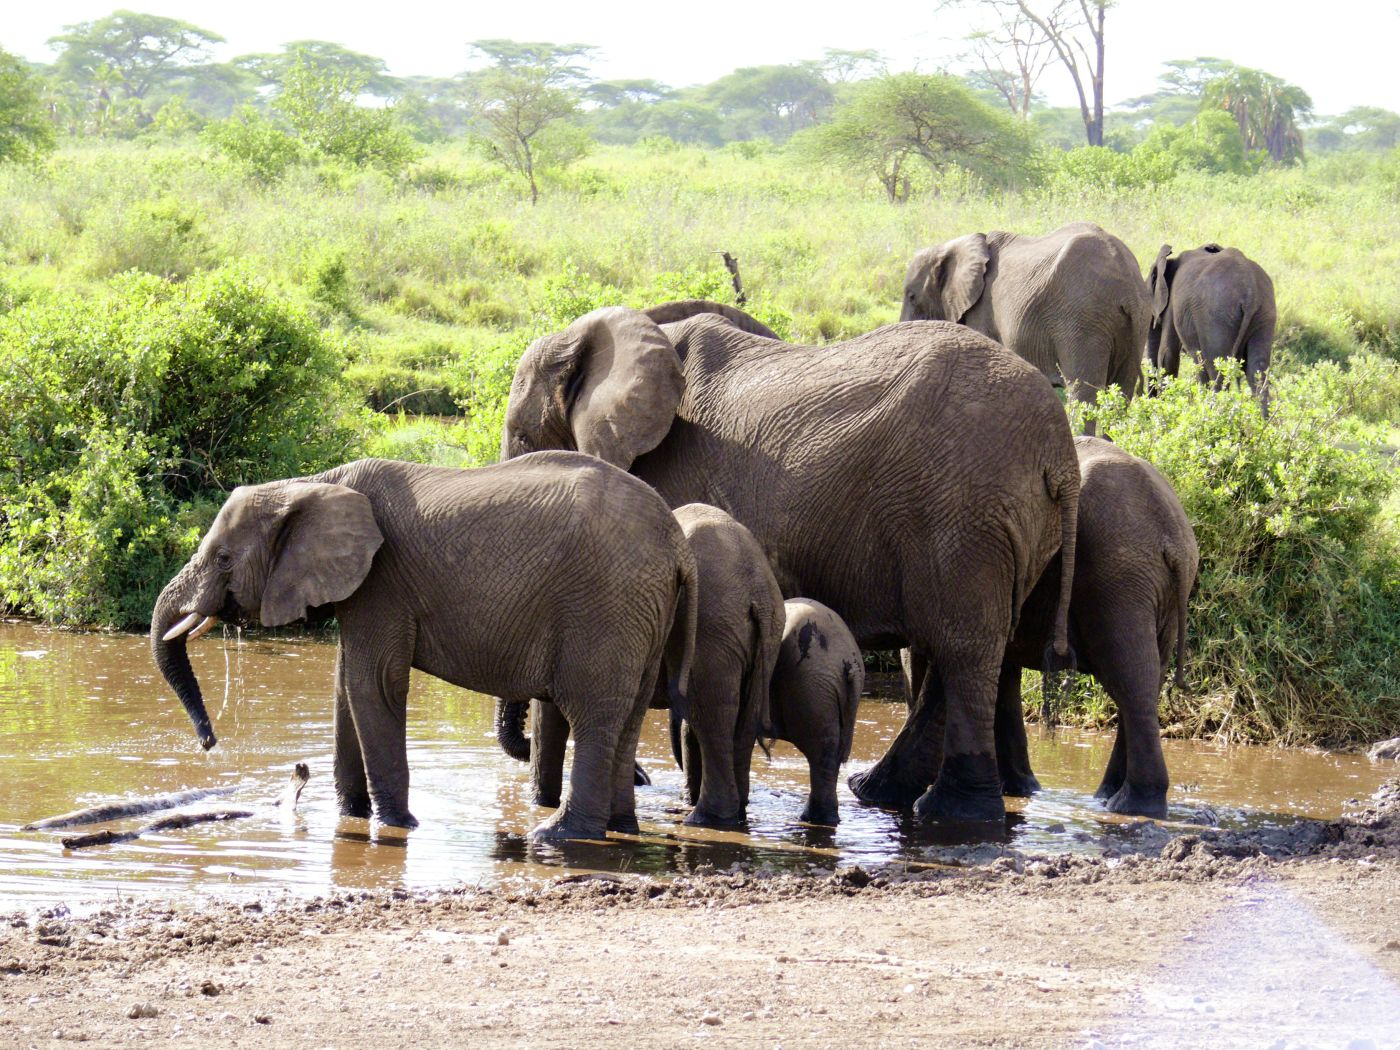 Elefanten (c) Marco Polo Reisen